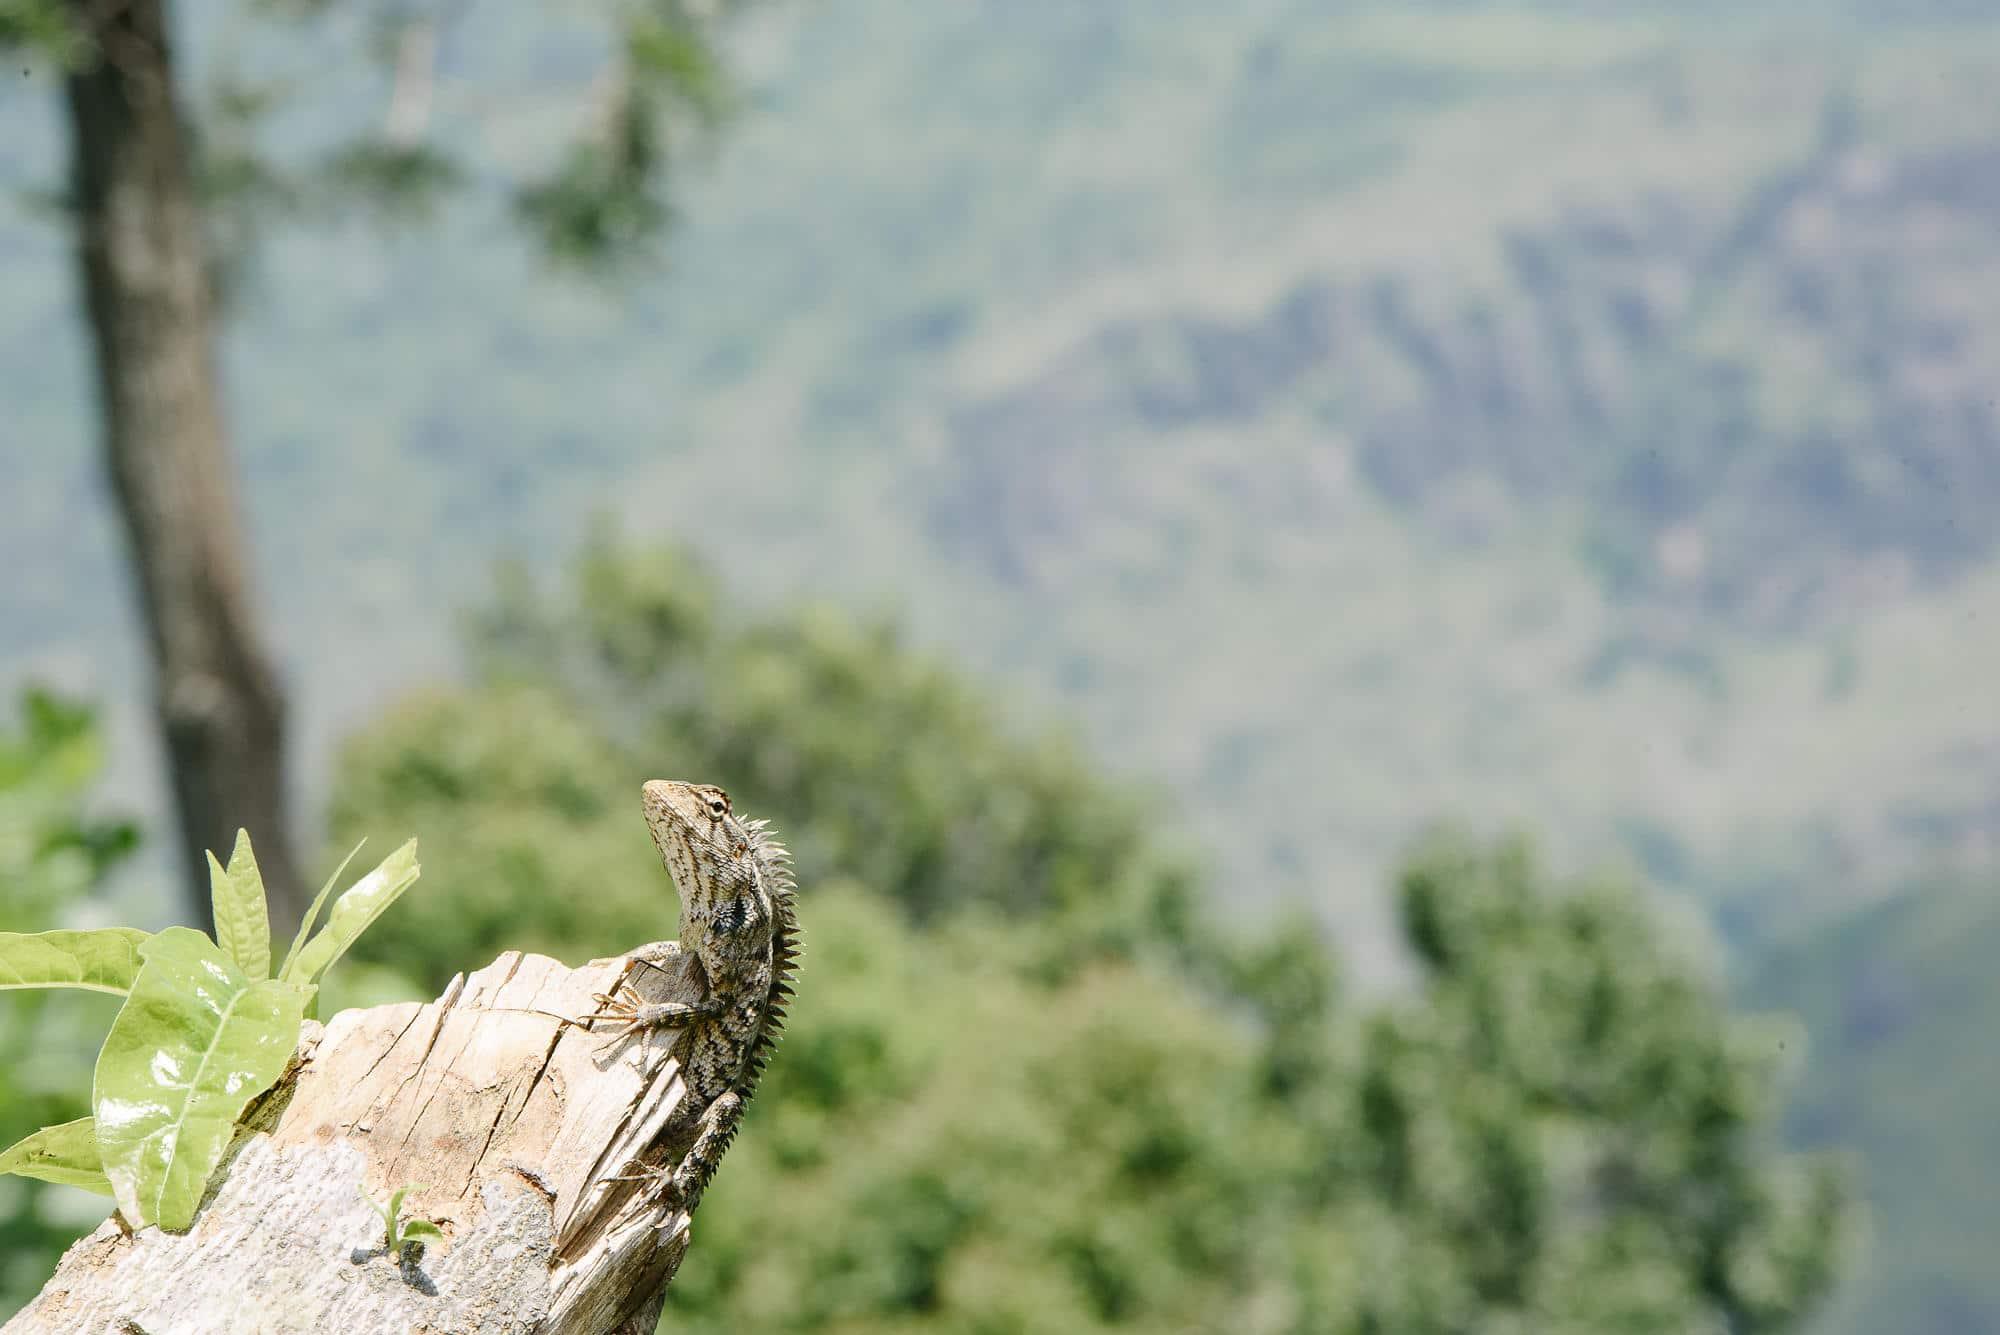 Our two week tour of Sri Lanka 13